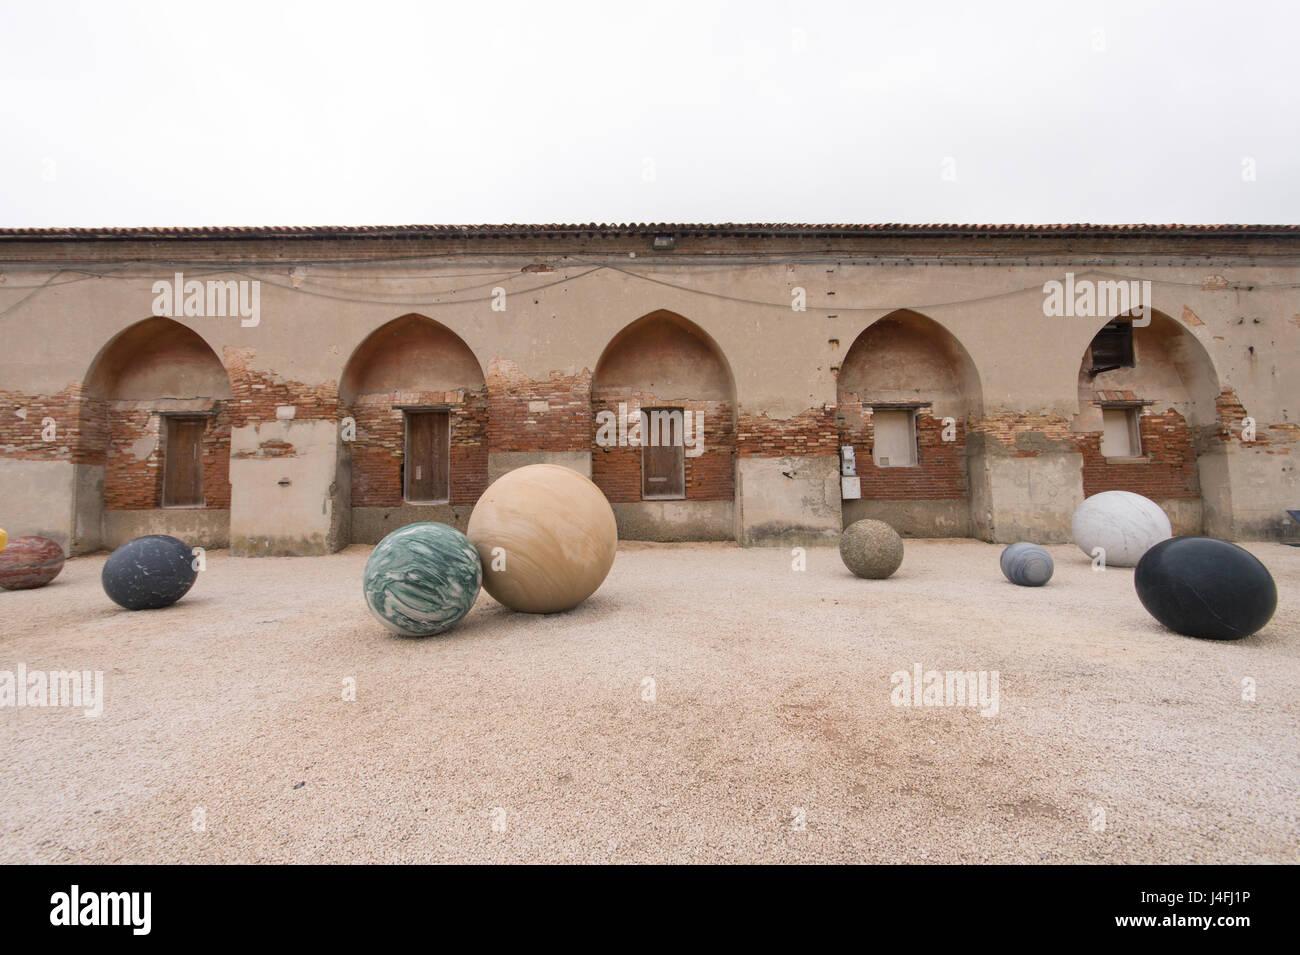 Alicja Kwade, Pars pro Toto, 2017, sculpture installation, Venice Art Biennale 2017, core exhibition at Arsenale - Stock Image